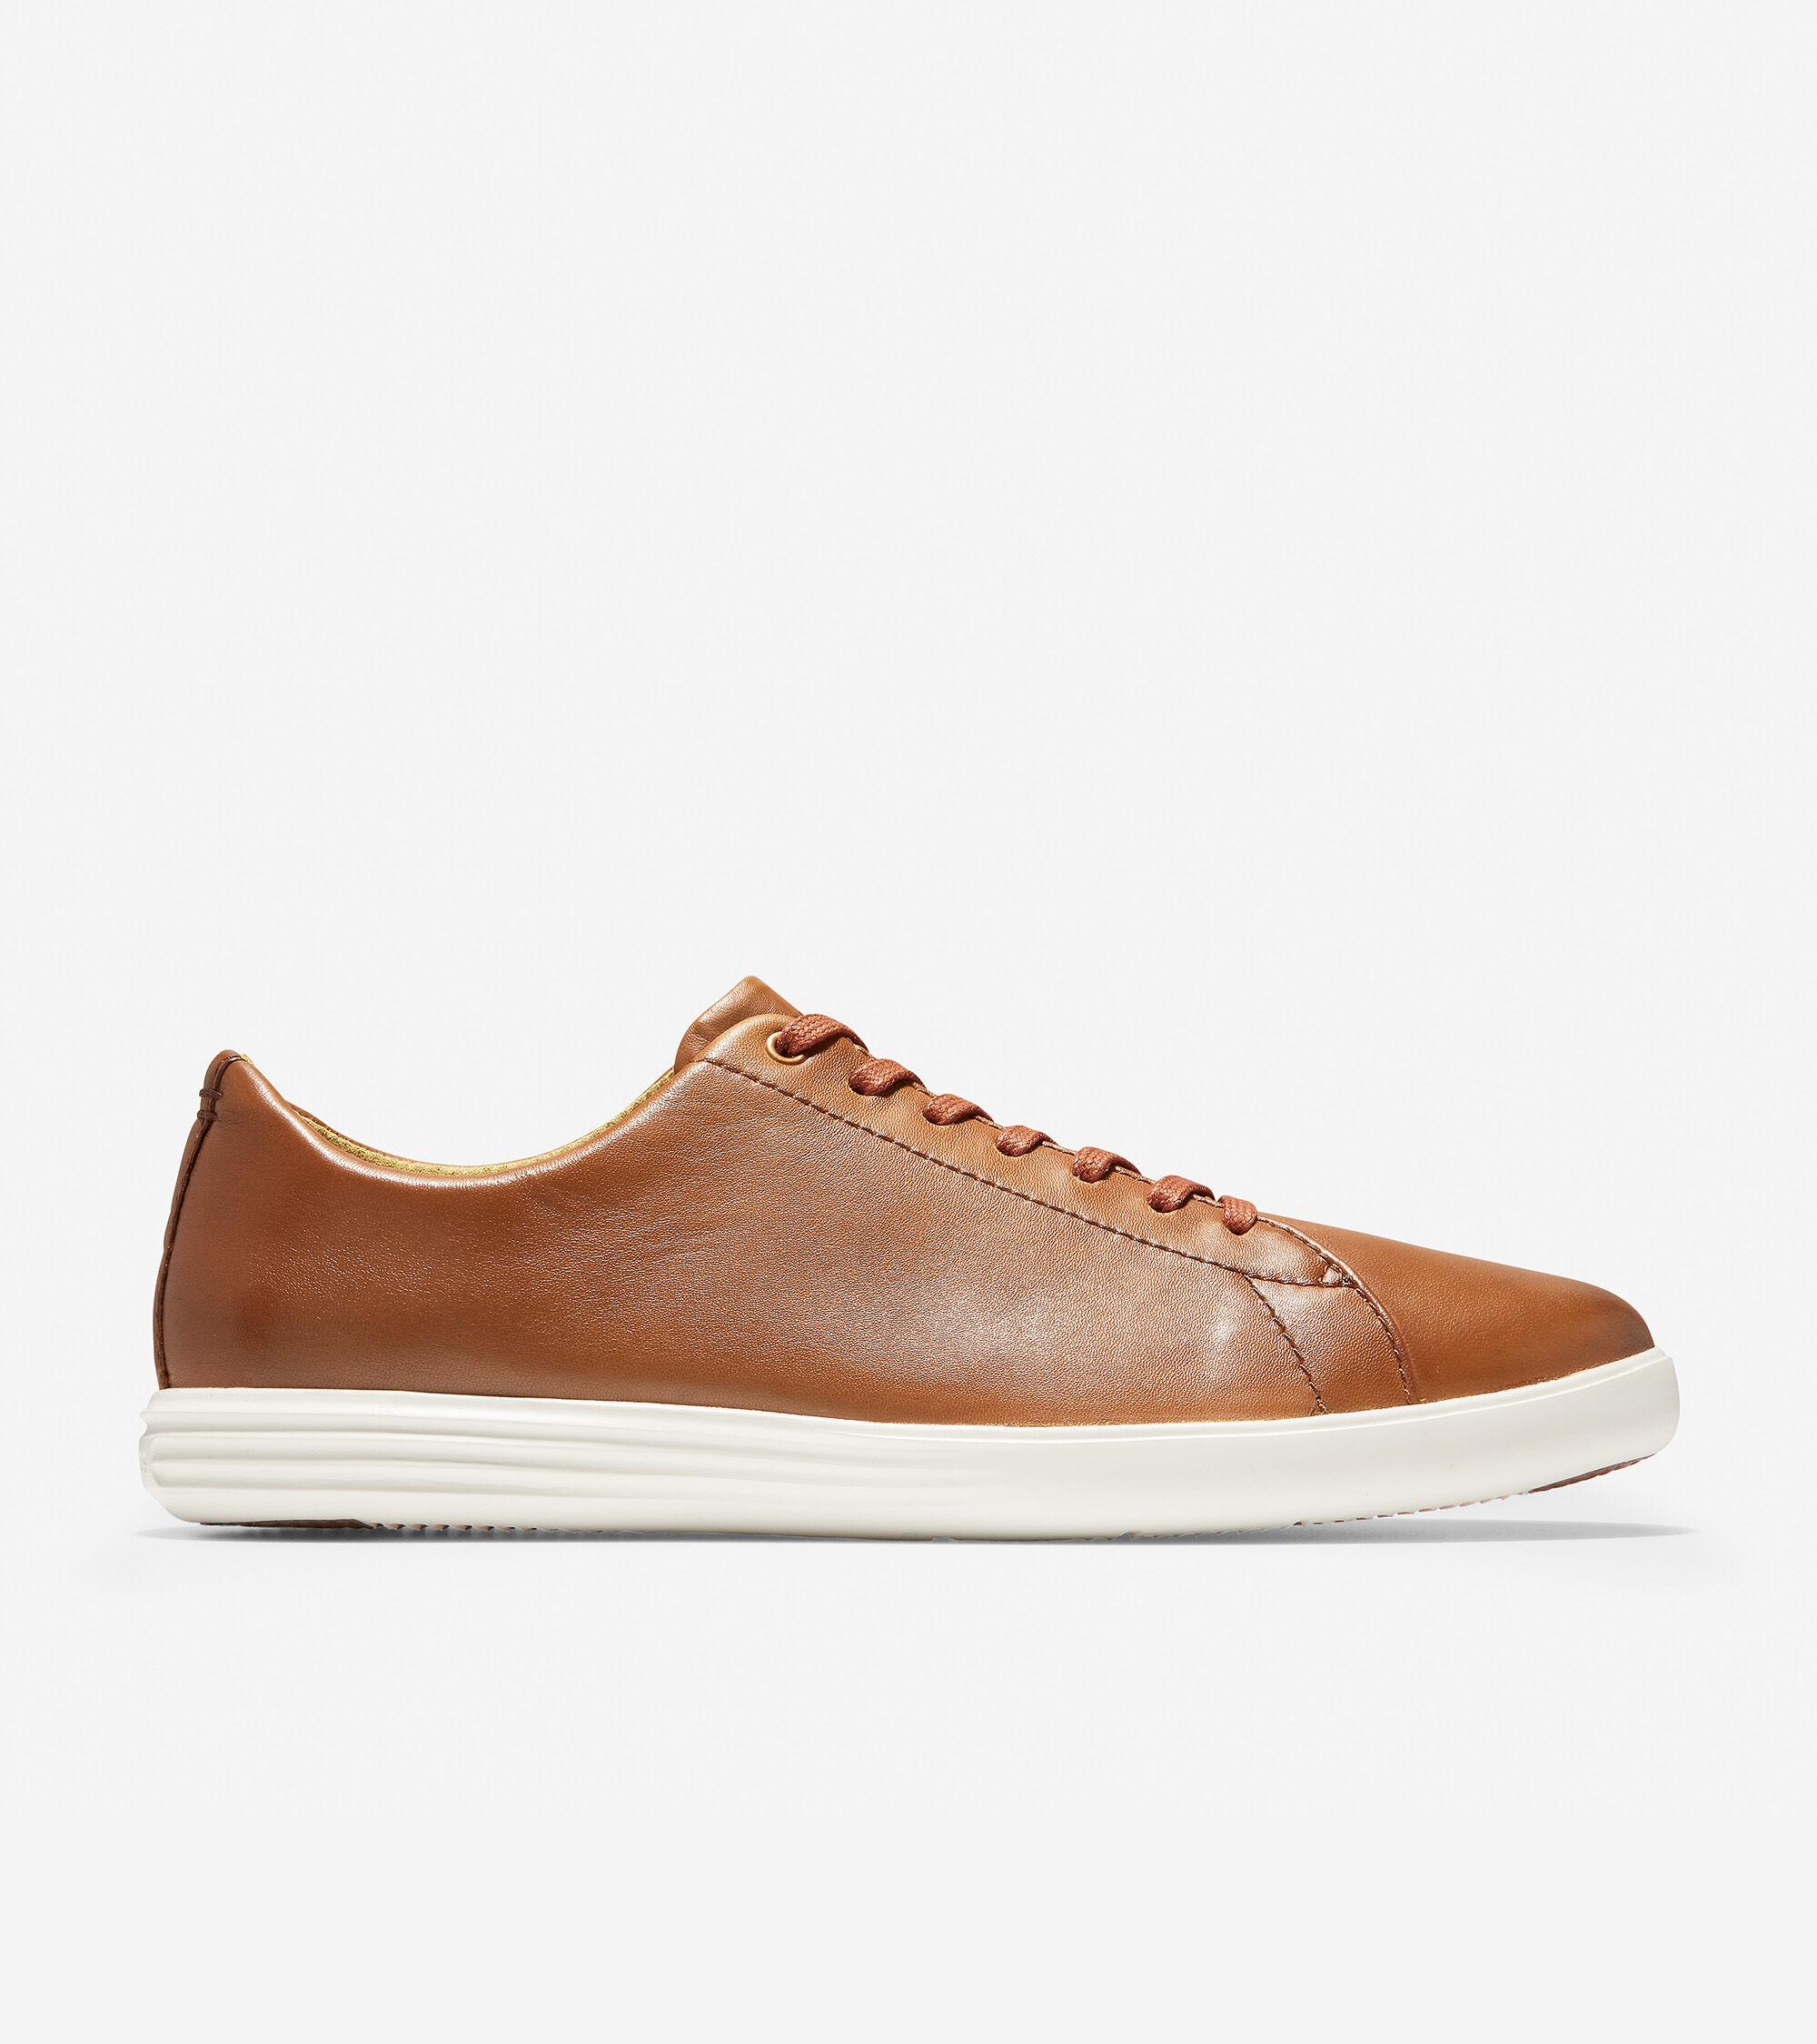 521c798a6ba Men s Grand Crosscourt Sneakers in Tan Leather